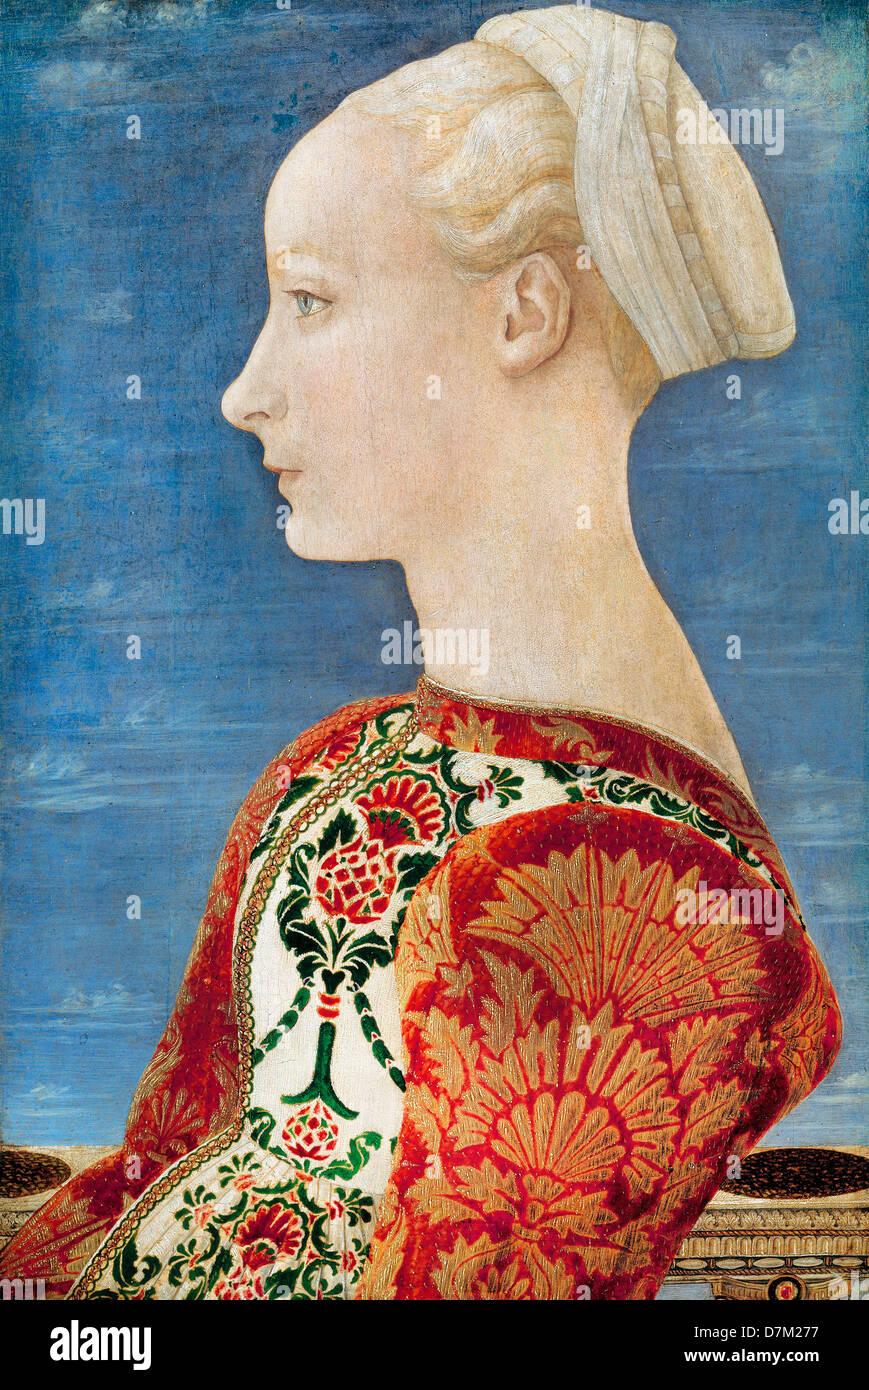 Domenico Veneziano, Profile Portrait of a Young Lady 1465 Oil on poplar wood. Gemaldegalerie, Berlin - Stock Image